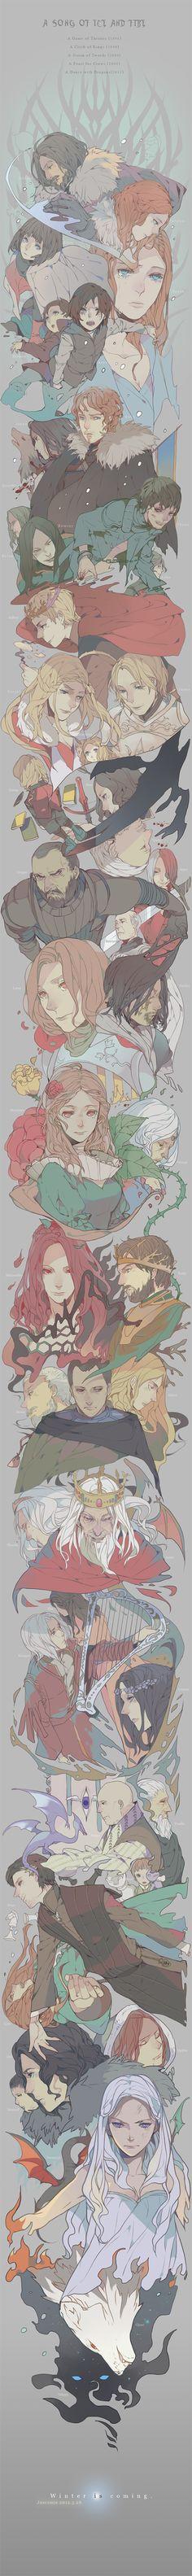 Winter is coming en fresque manga